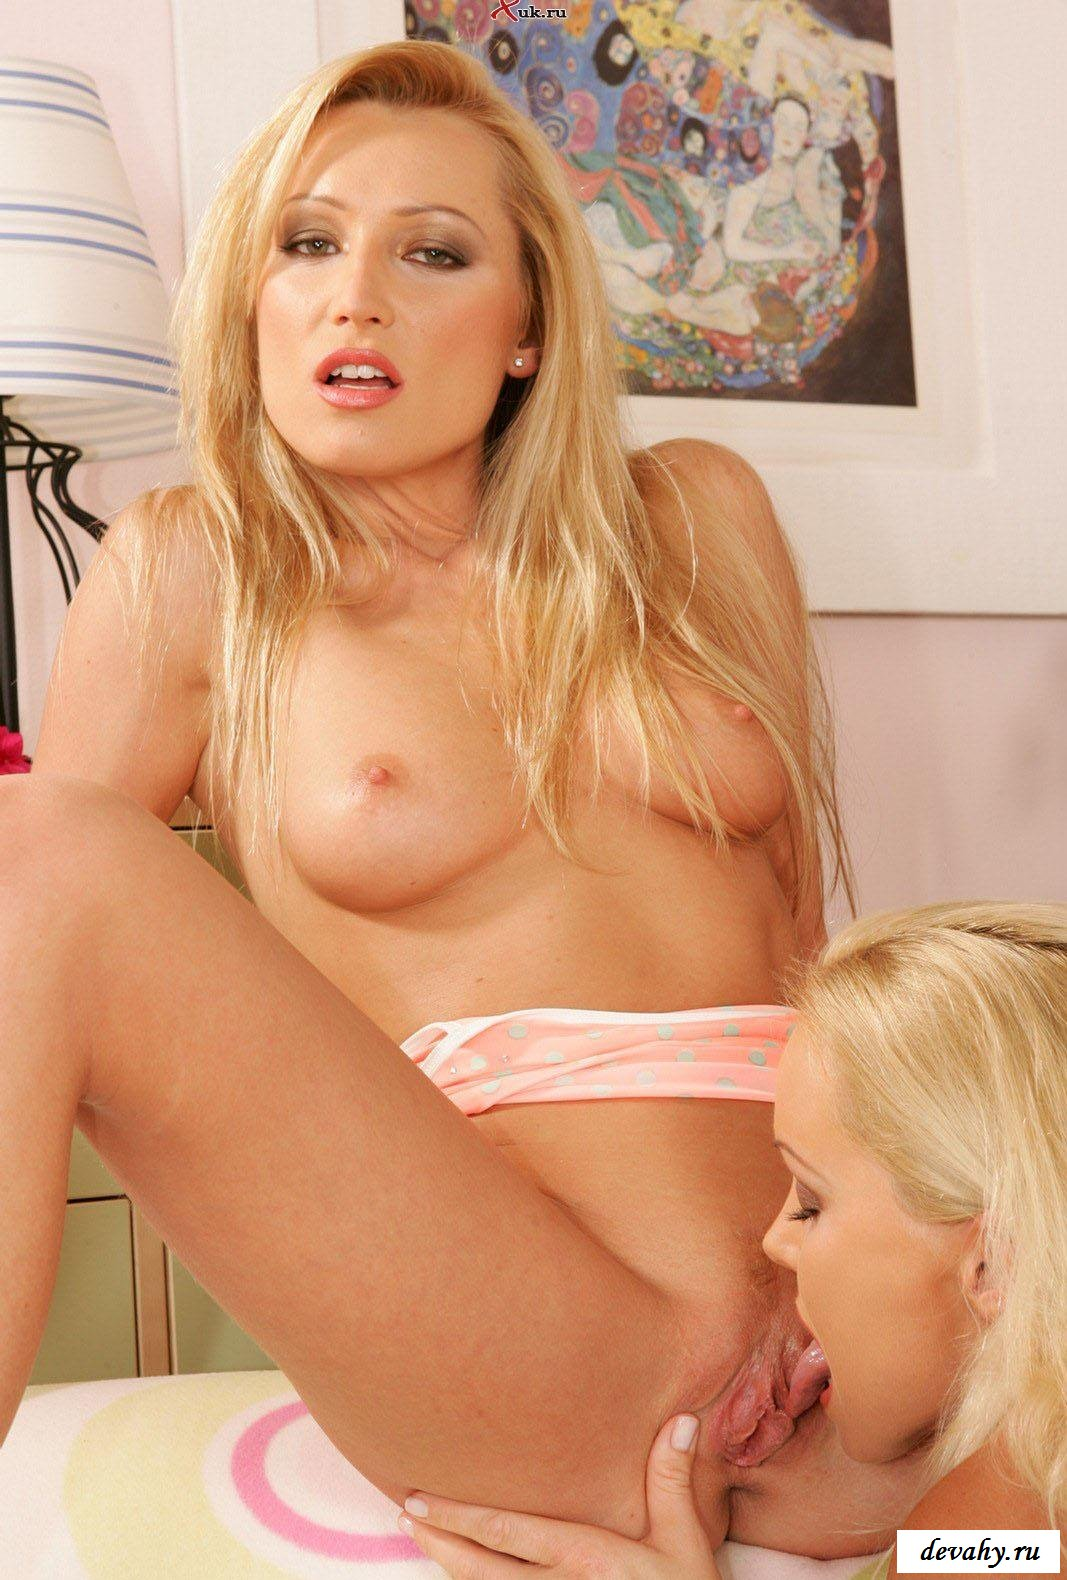 Блондиночки жадно целуются